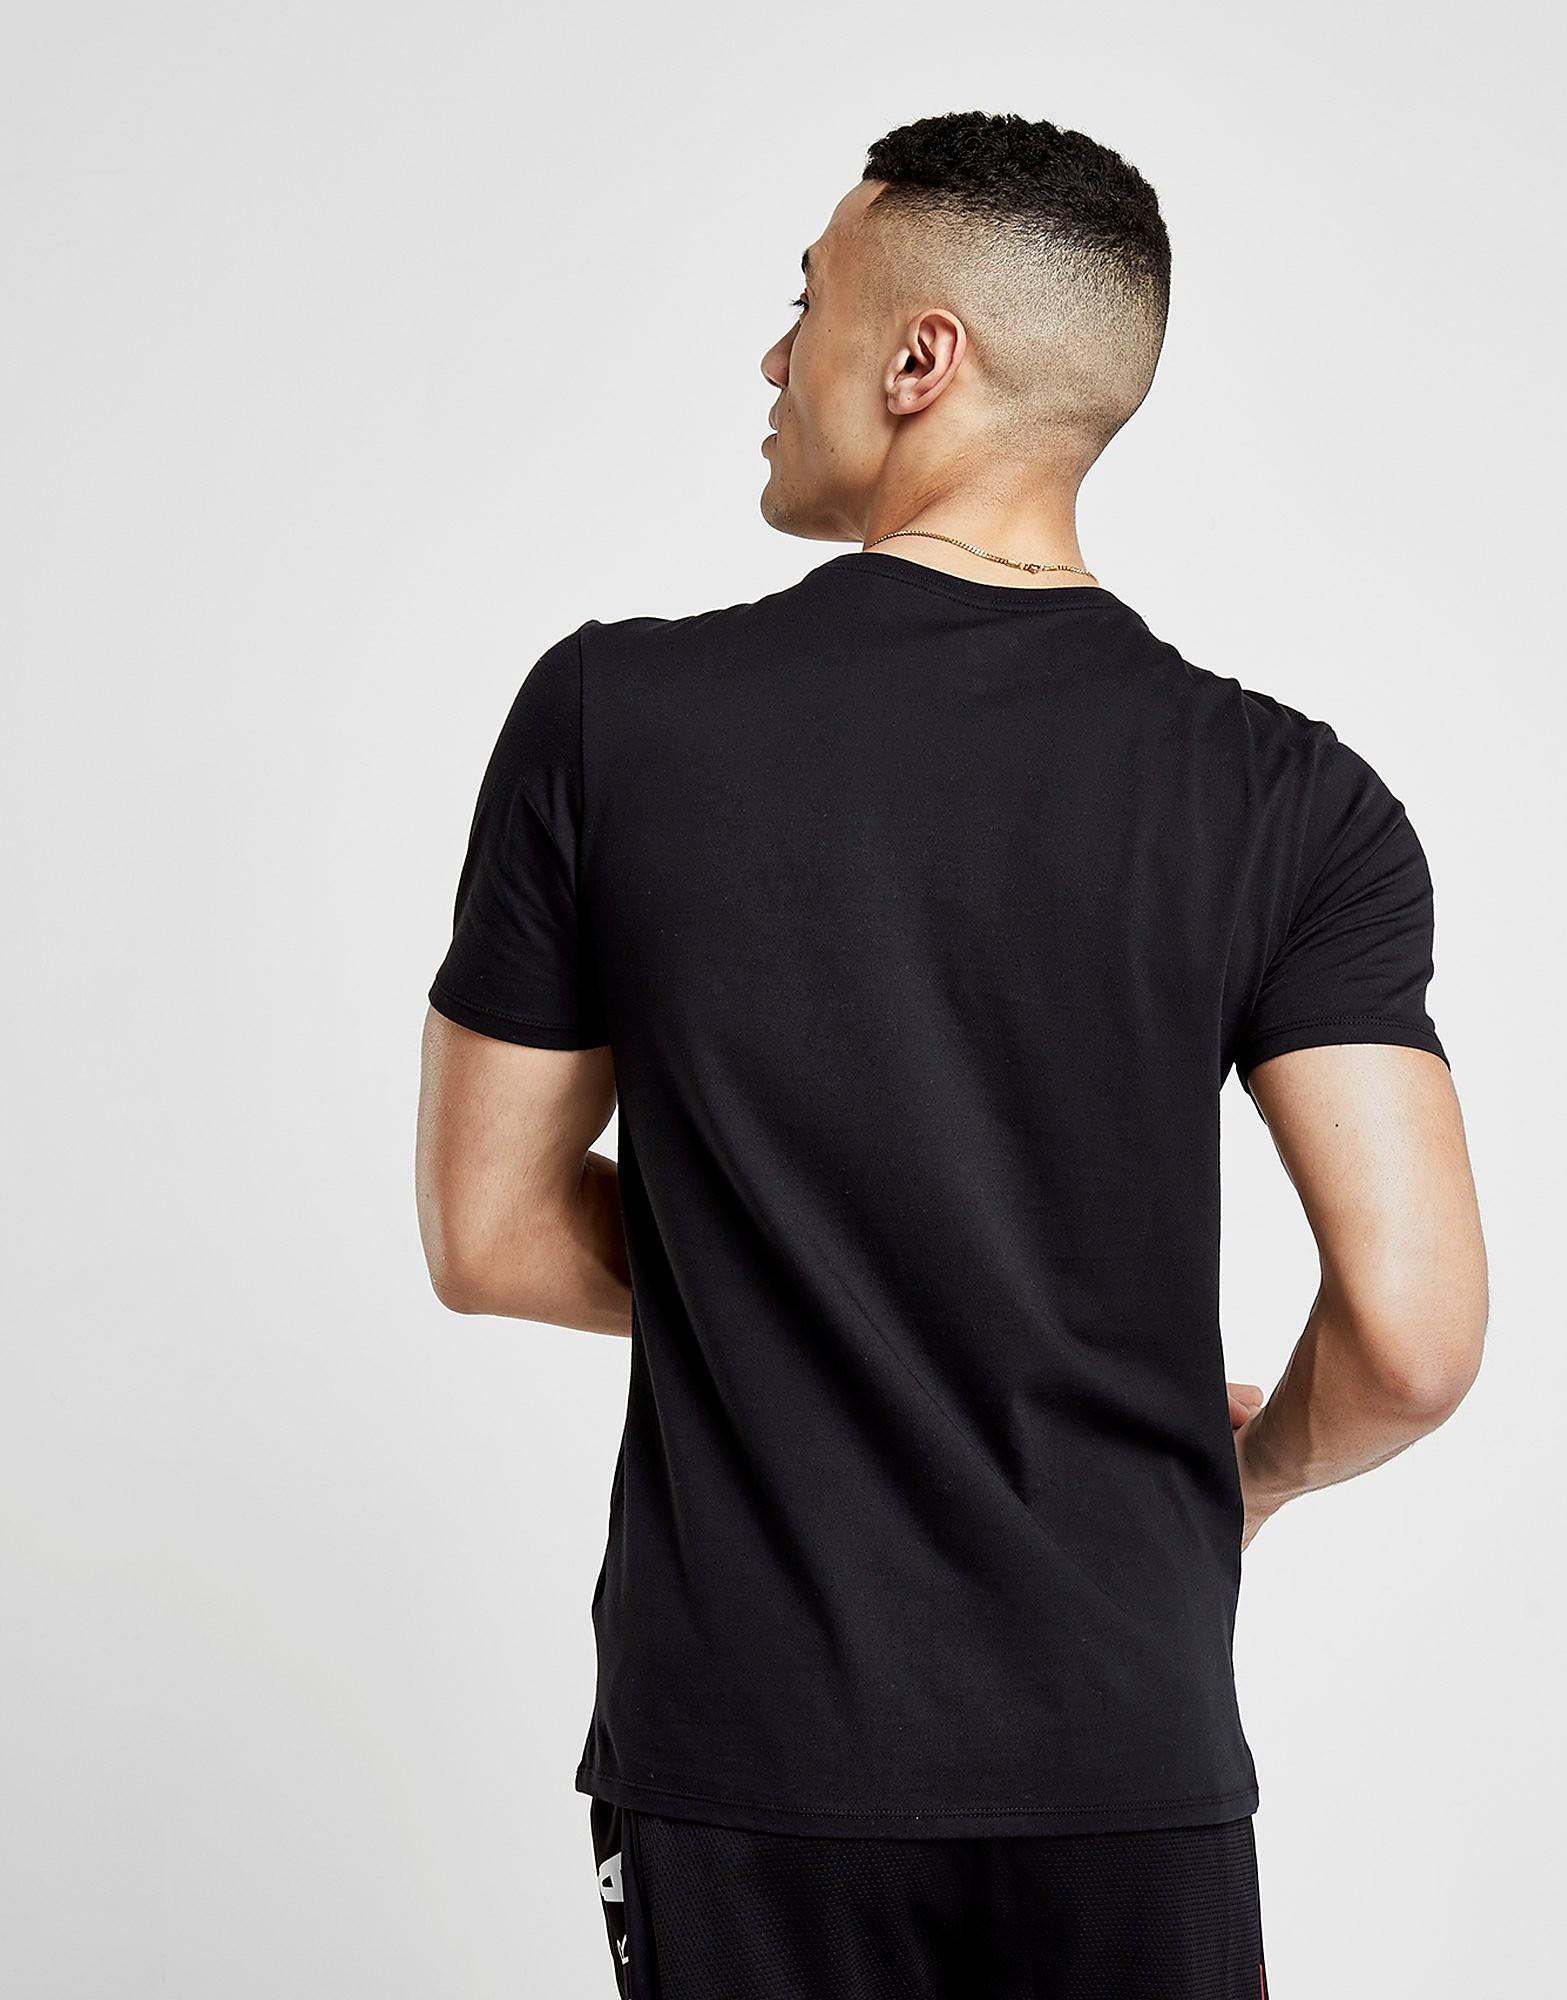 Jordan 23 T-Shirt Homme